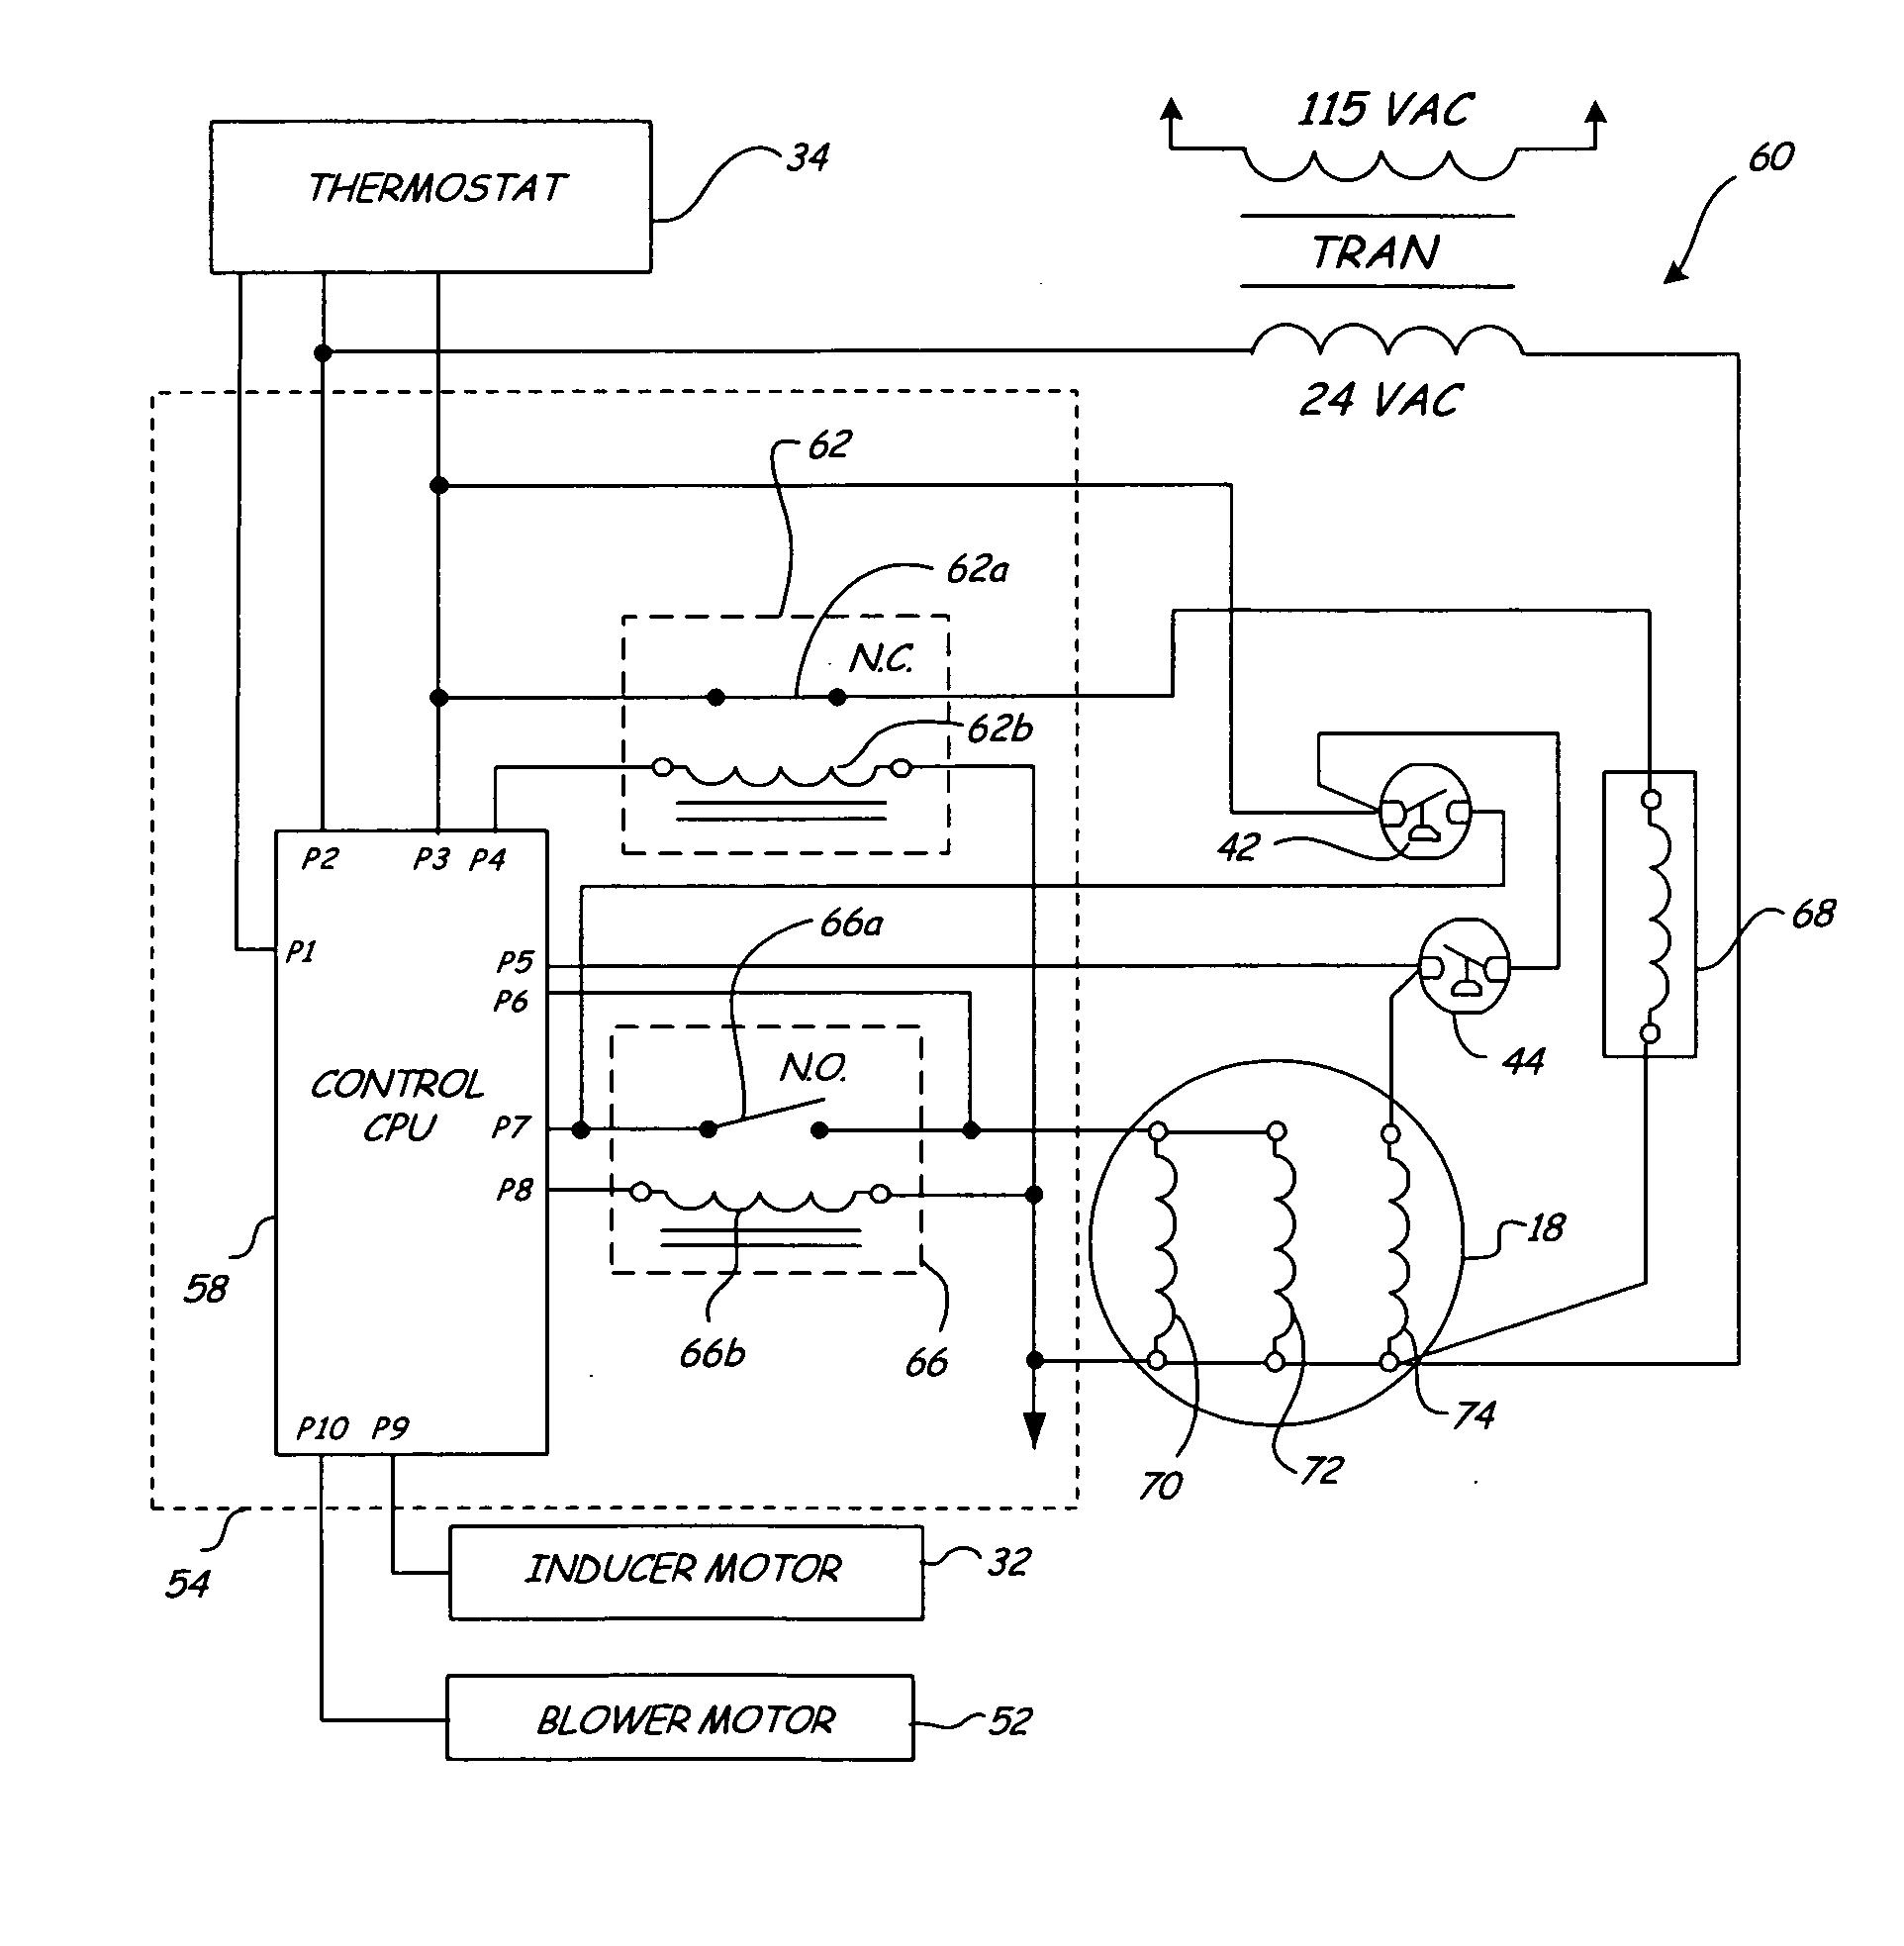 Dayton Thermostat Wiring Diagram Practical Modine Manual Guide